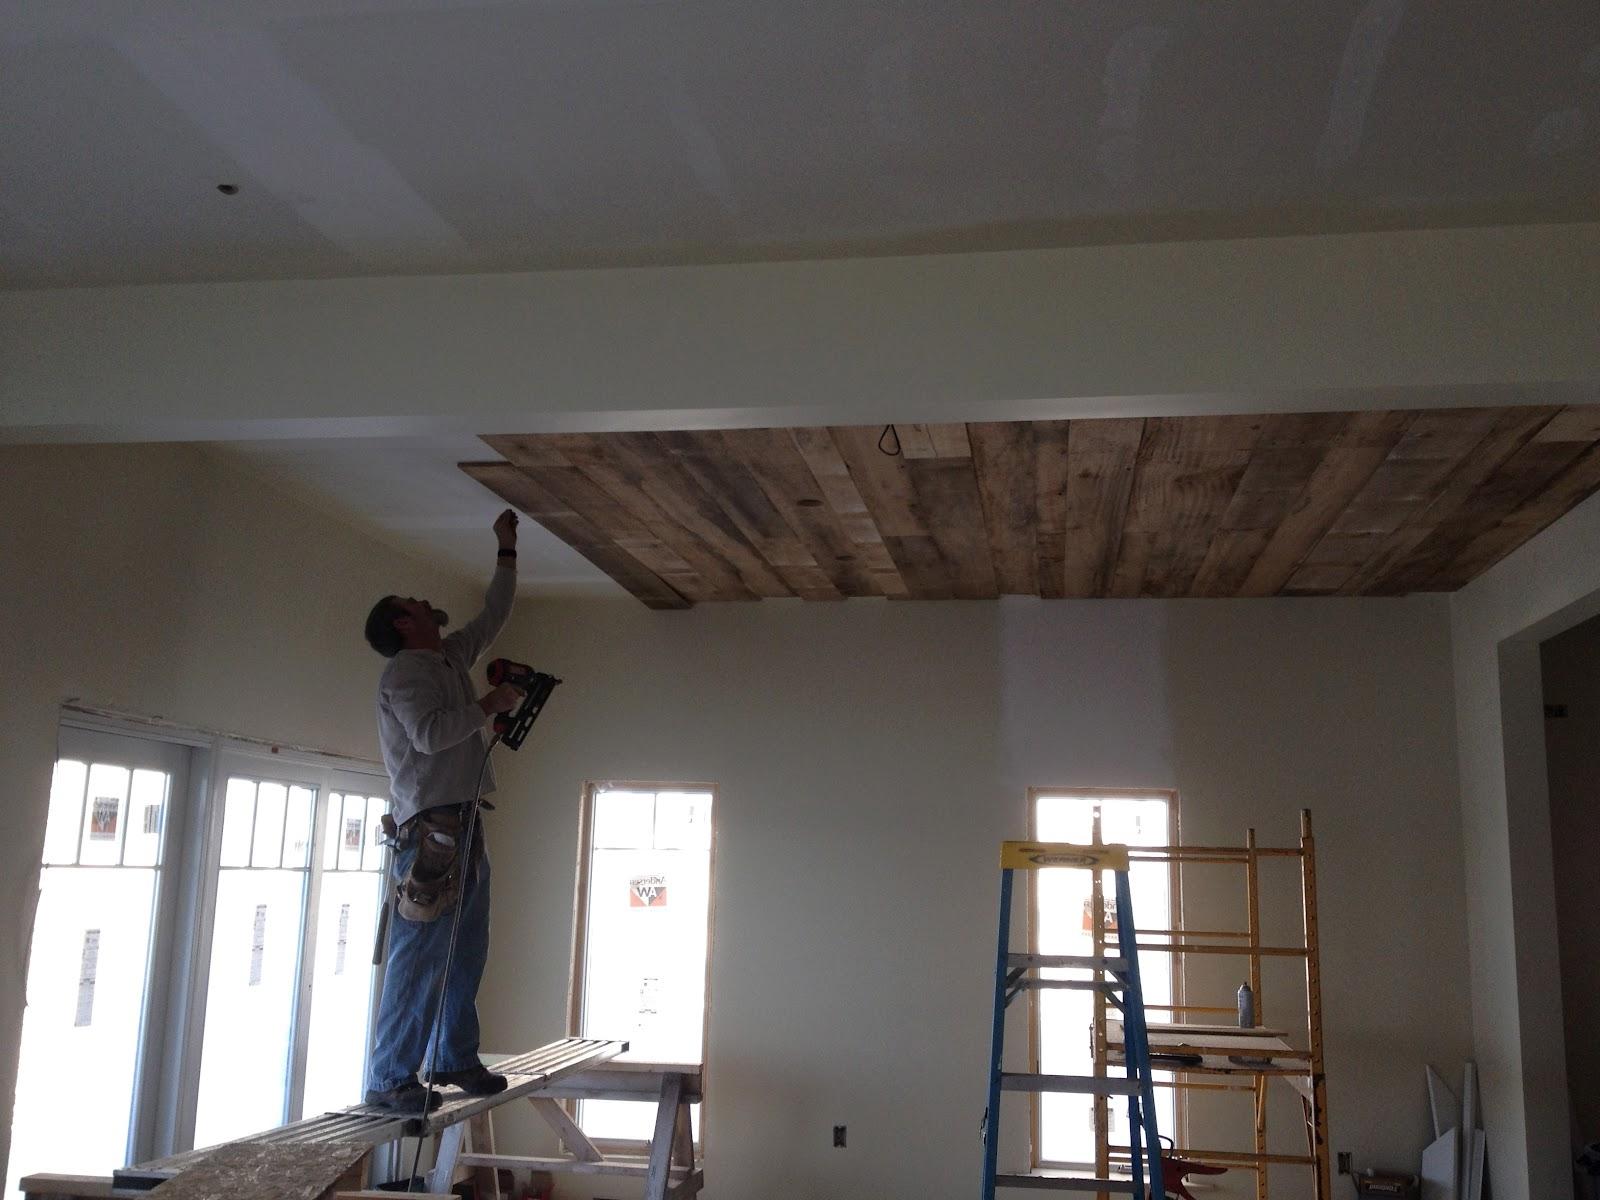 Jordan Fine Woodworking: Reclaimed | Indiana Custom Woodworking